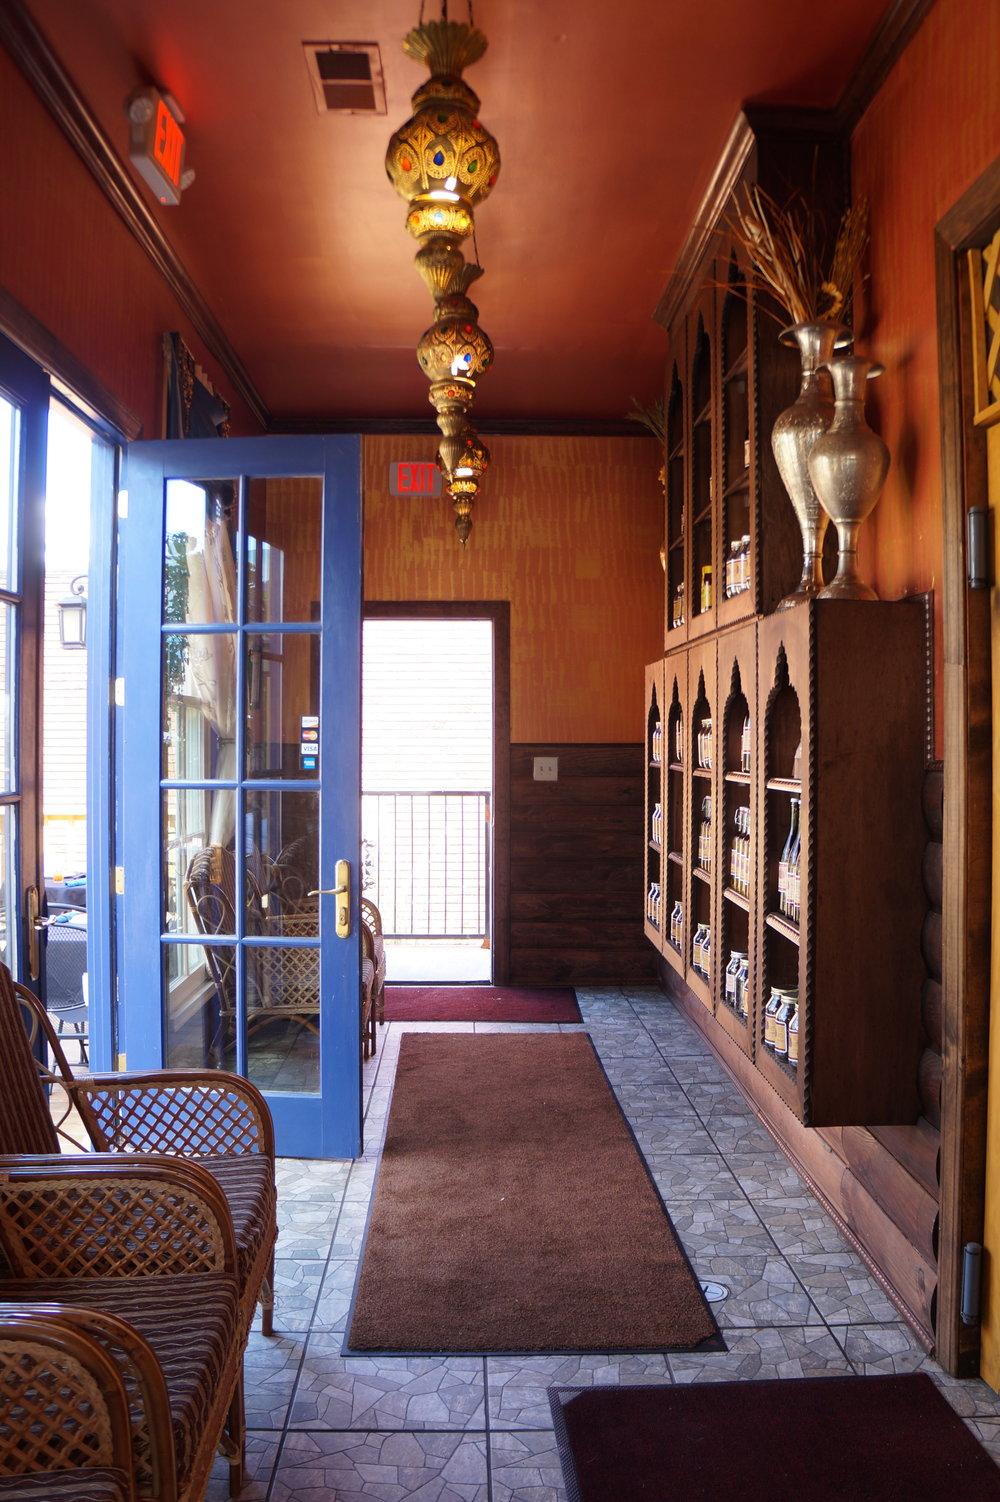 Andrea Fenise Memphis Fashion and Food Blogger reviews Casablanca Restaurant